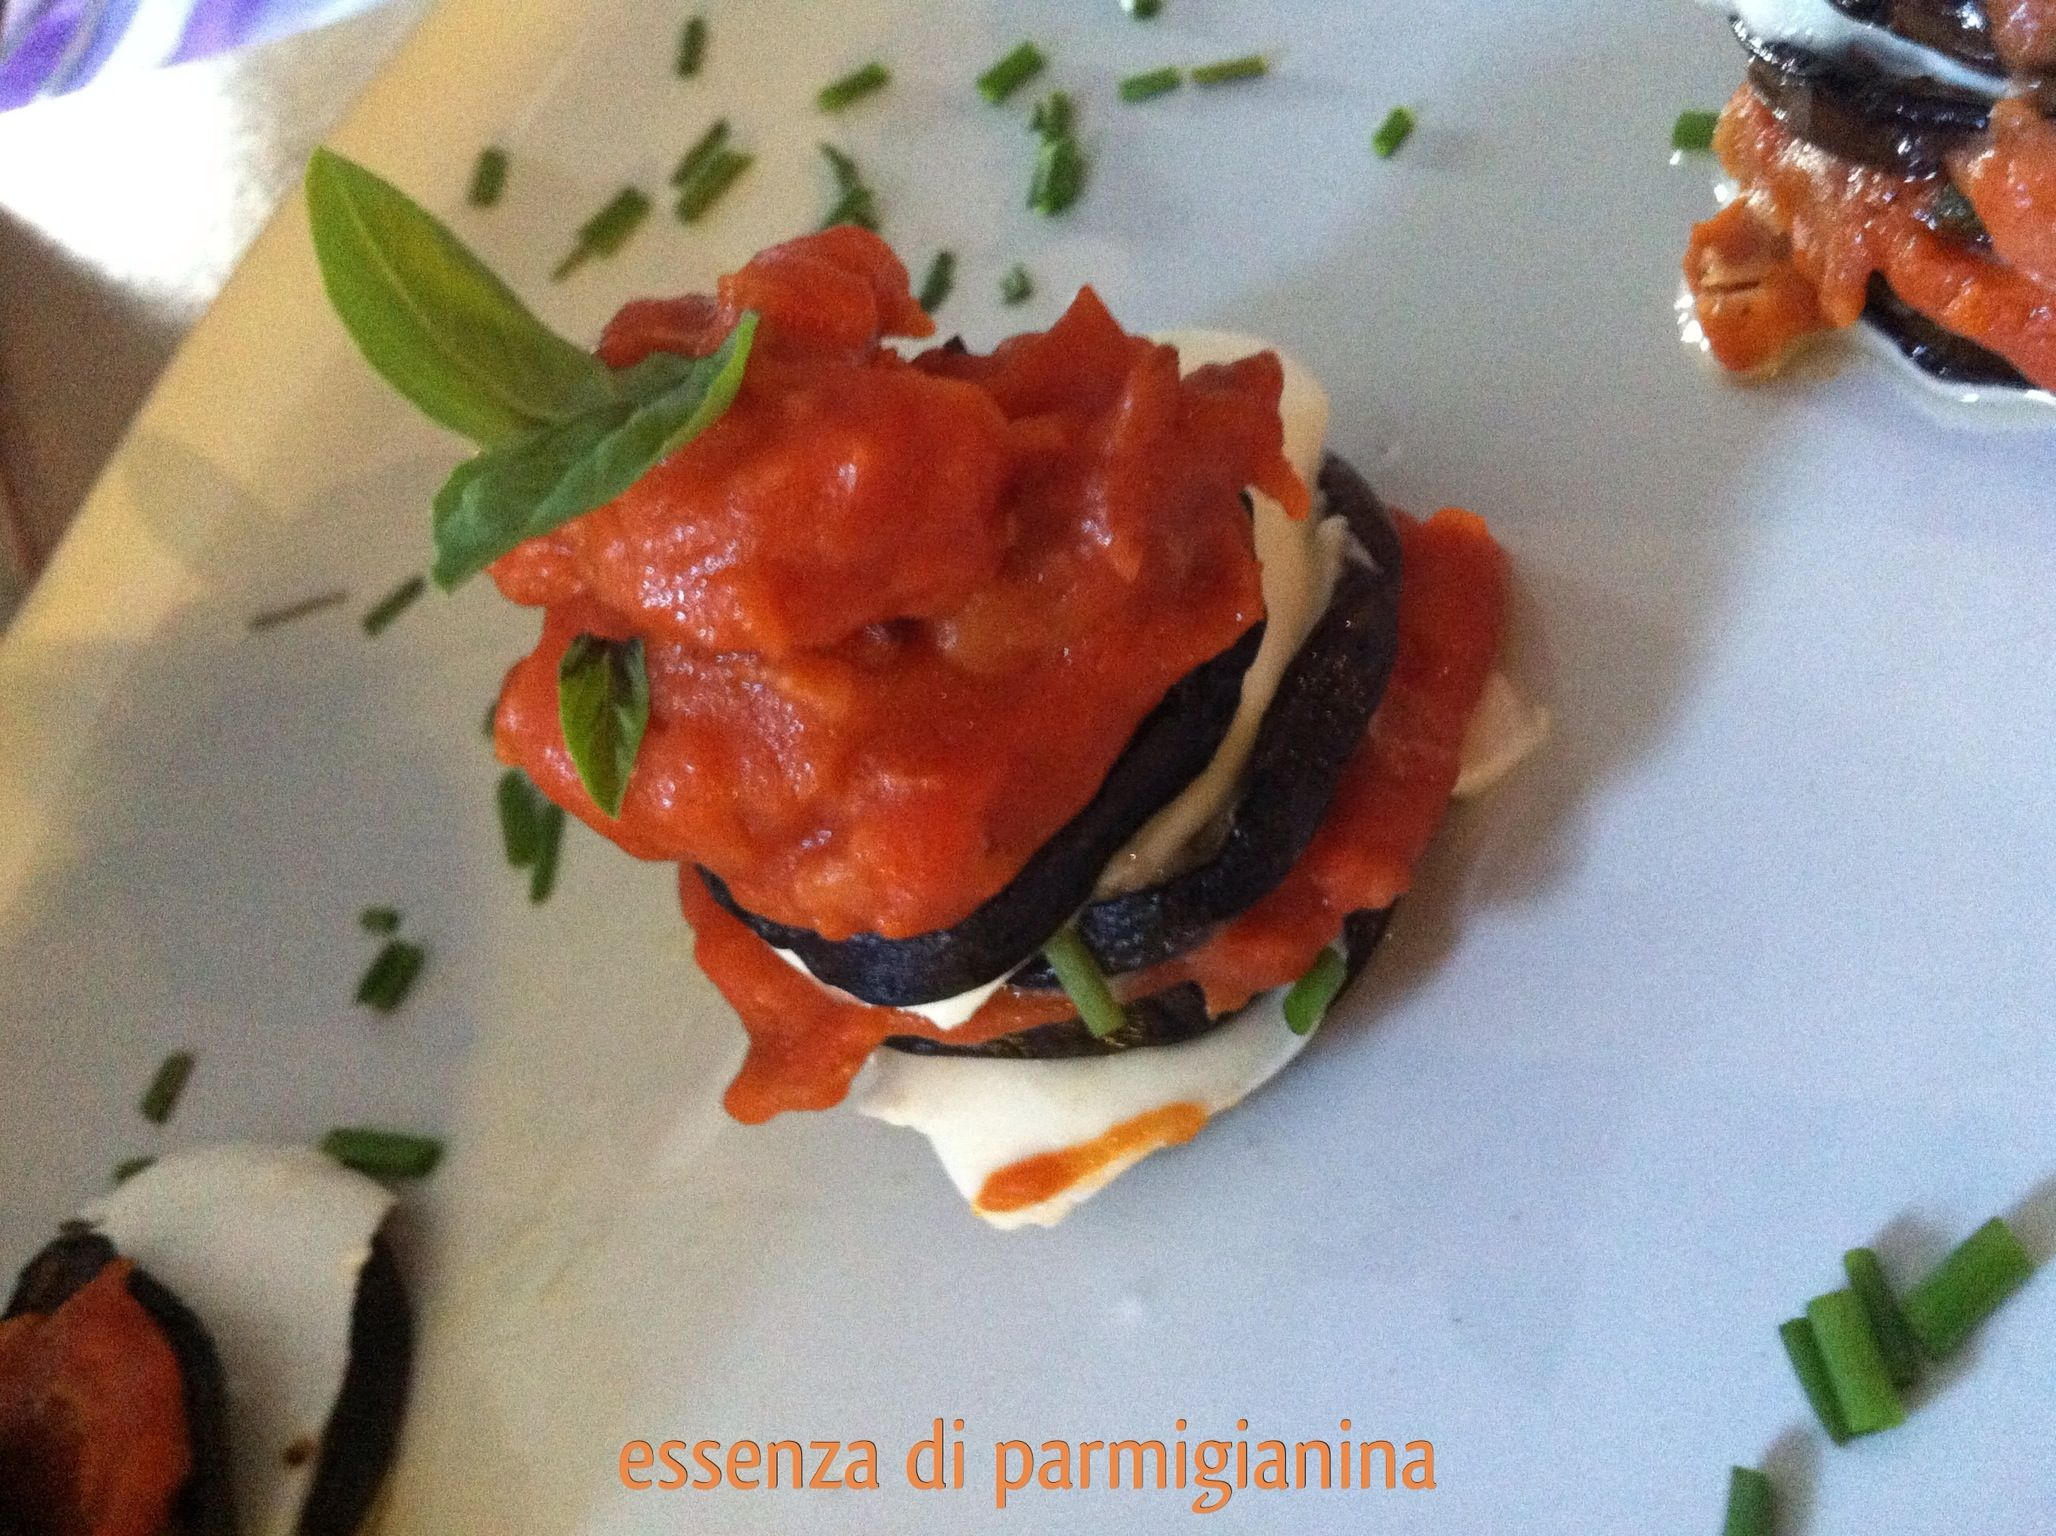 Mini Parmiggiana